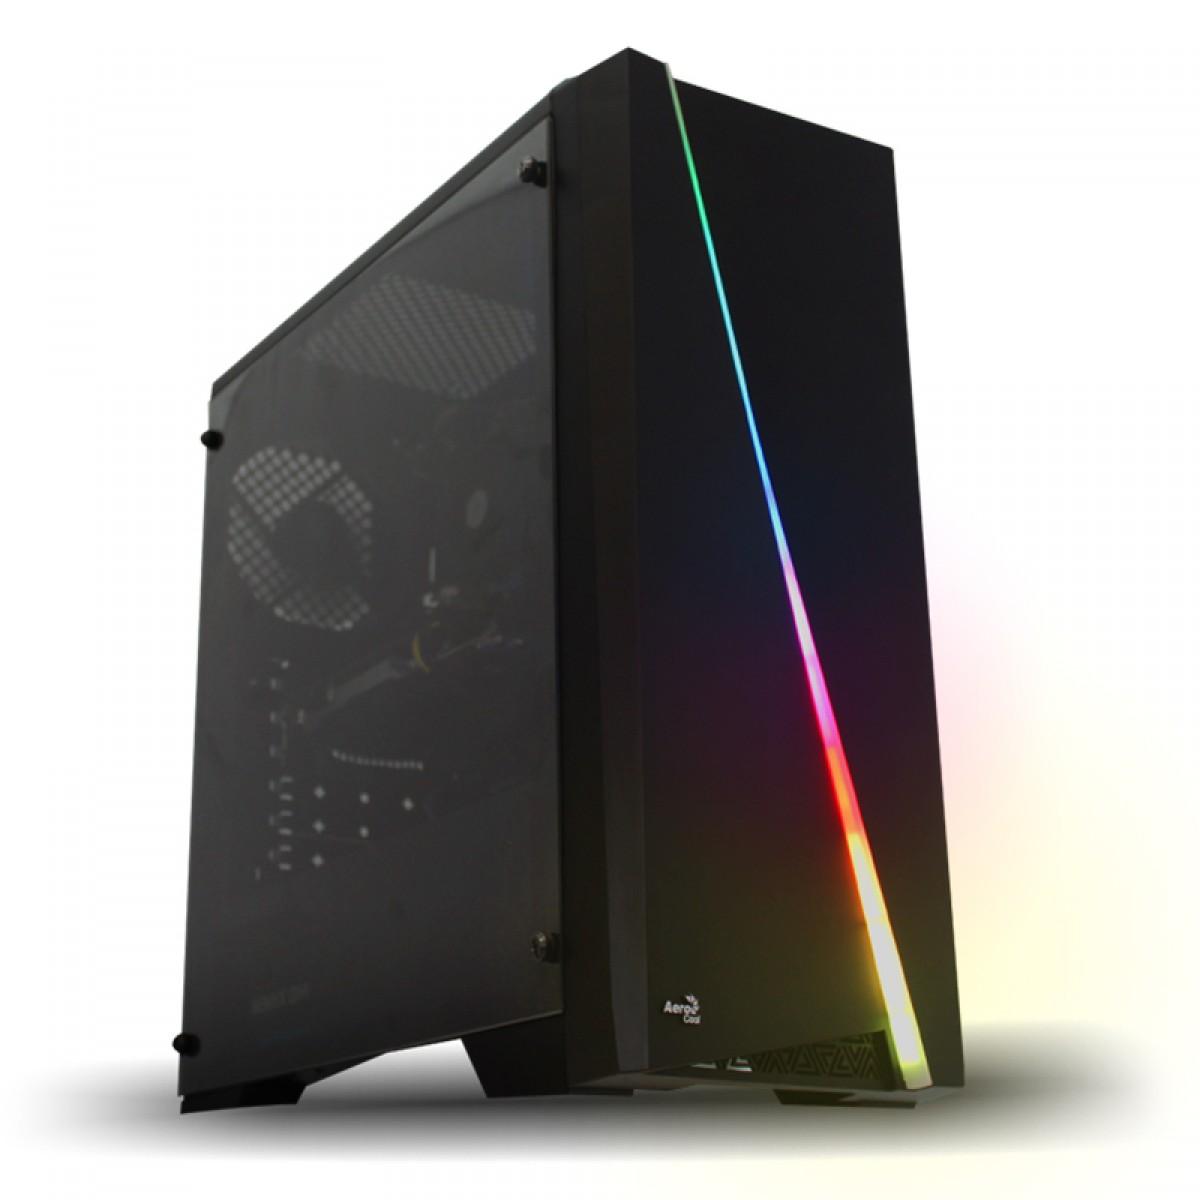 PC Gamer T-Power Inferno LVL-2 Intel I9 9900KF  / Geforce RTX 2070 8GB / DDR4 16GB / HD 1TB / 600W